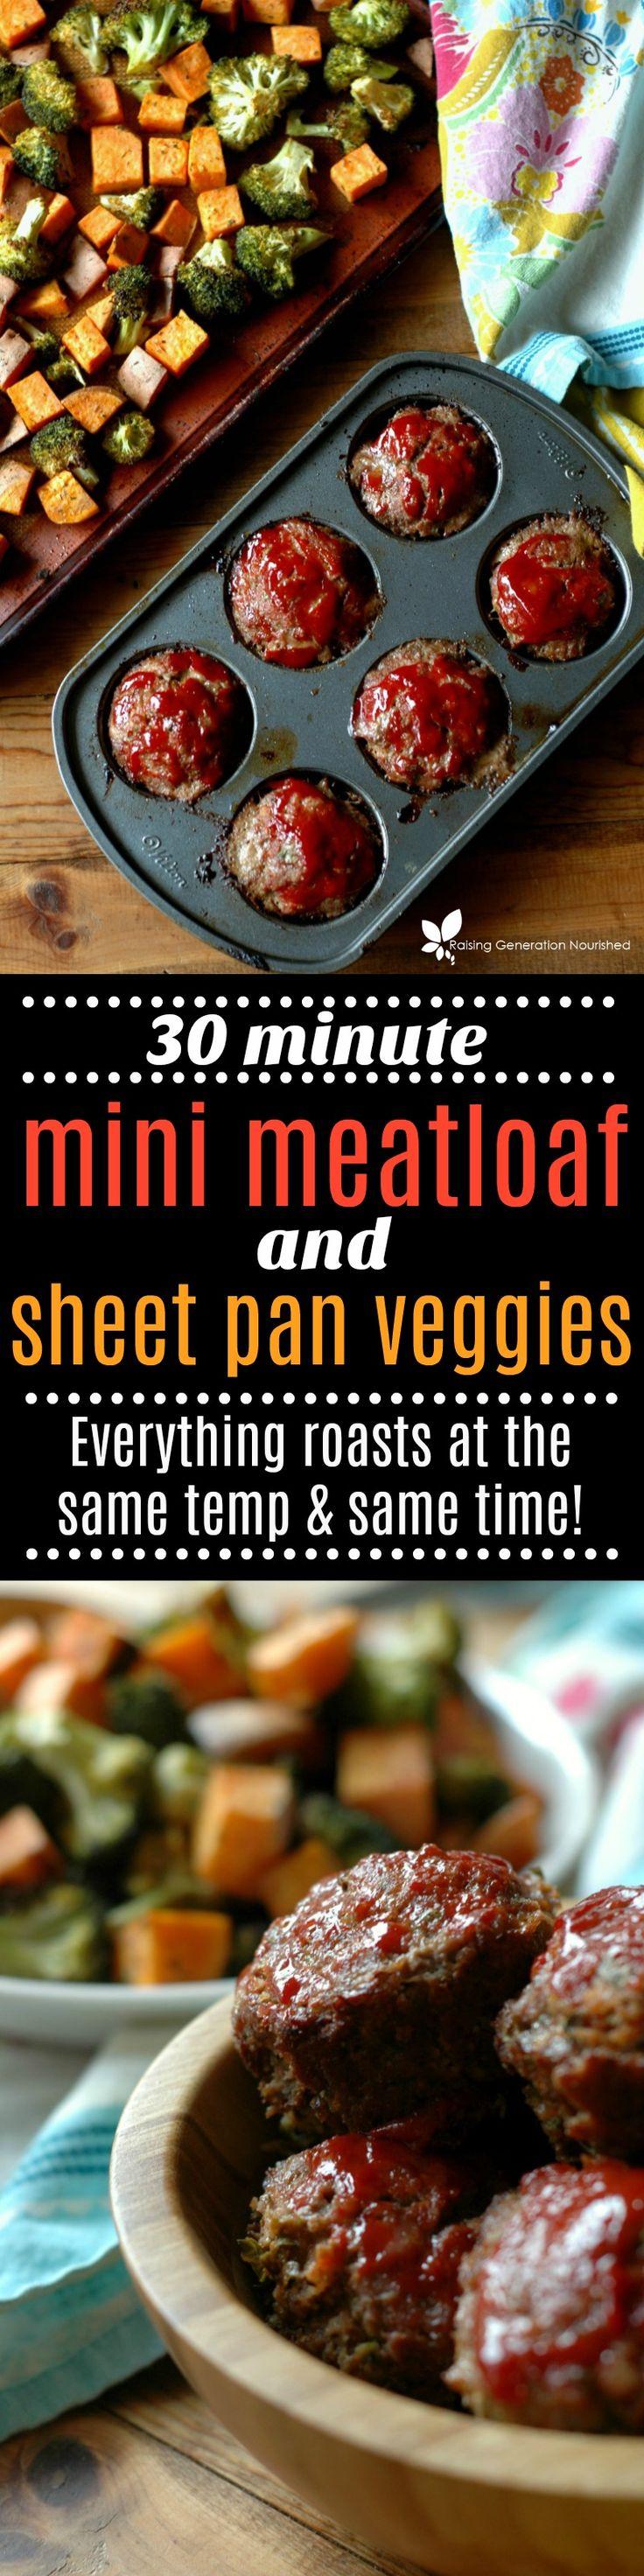 A nourishing, nutrient dense meatloaf dinner in weeknight fast prep time!